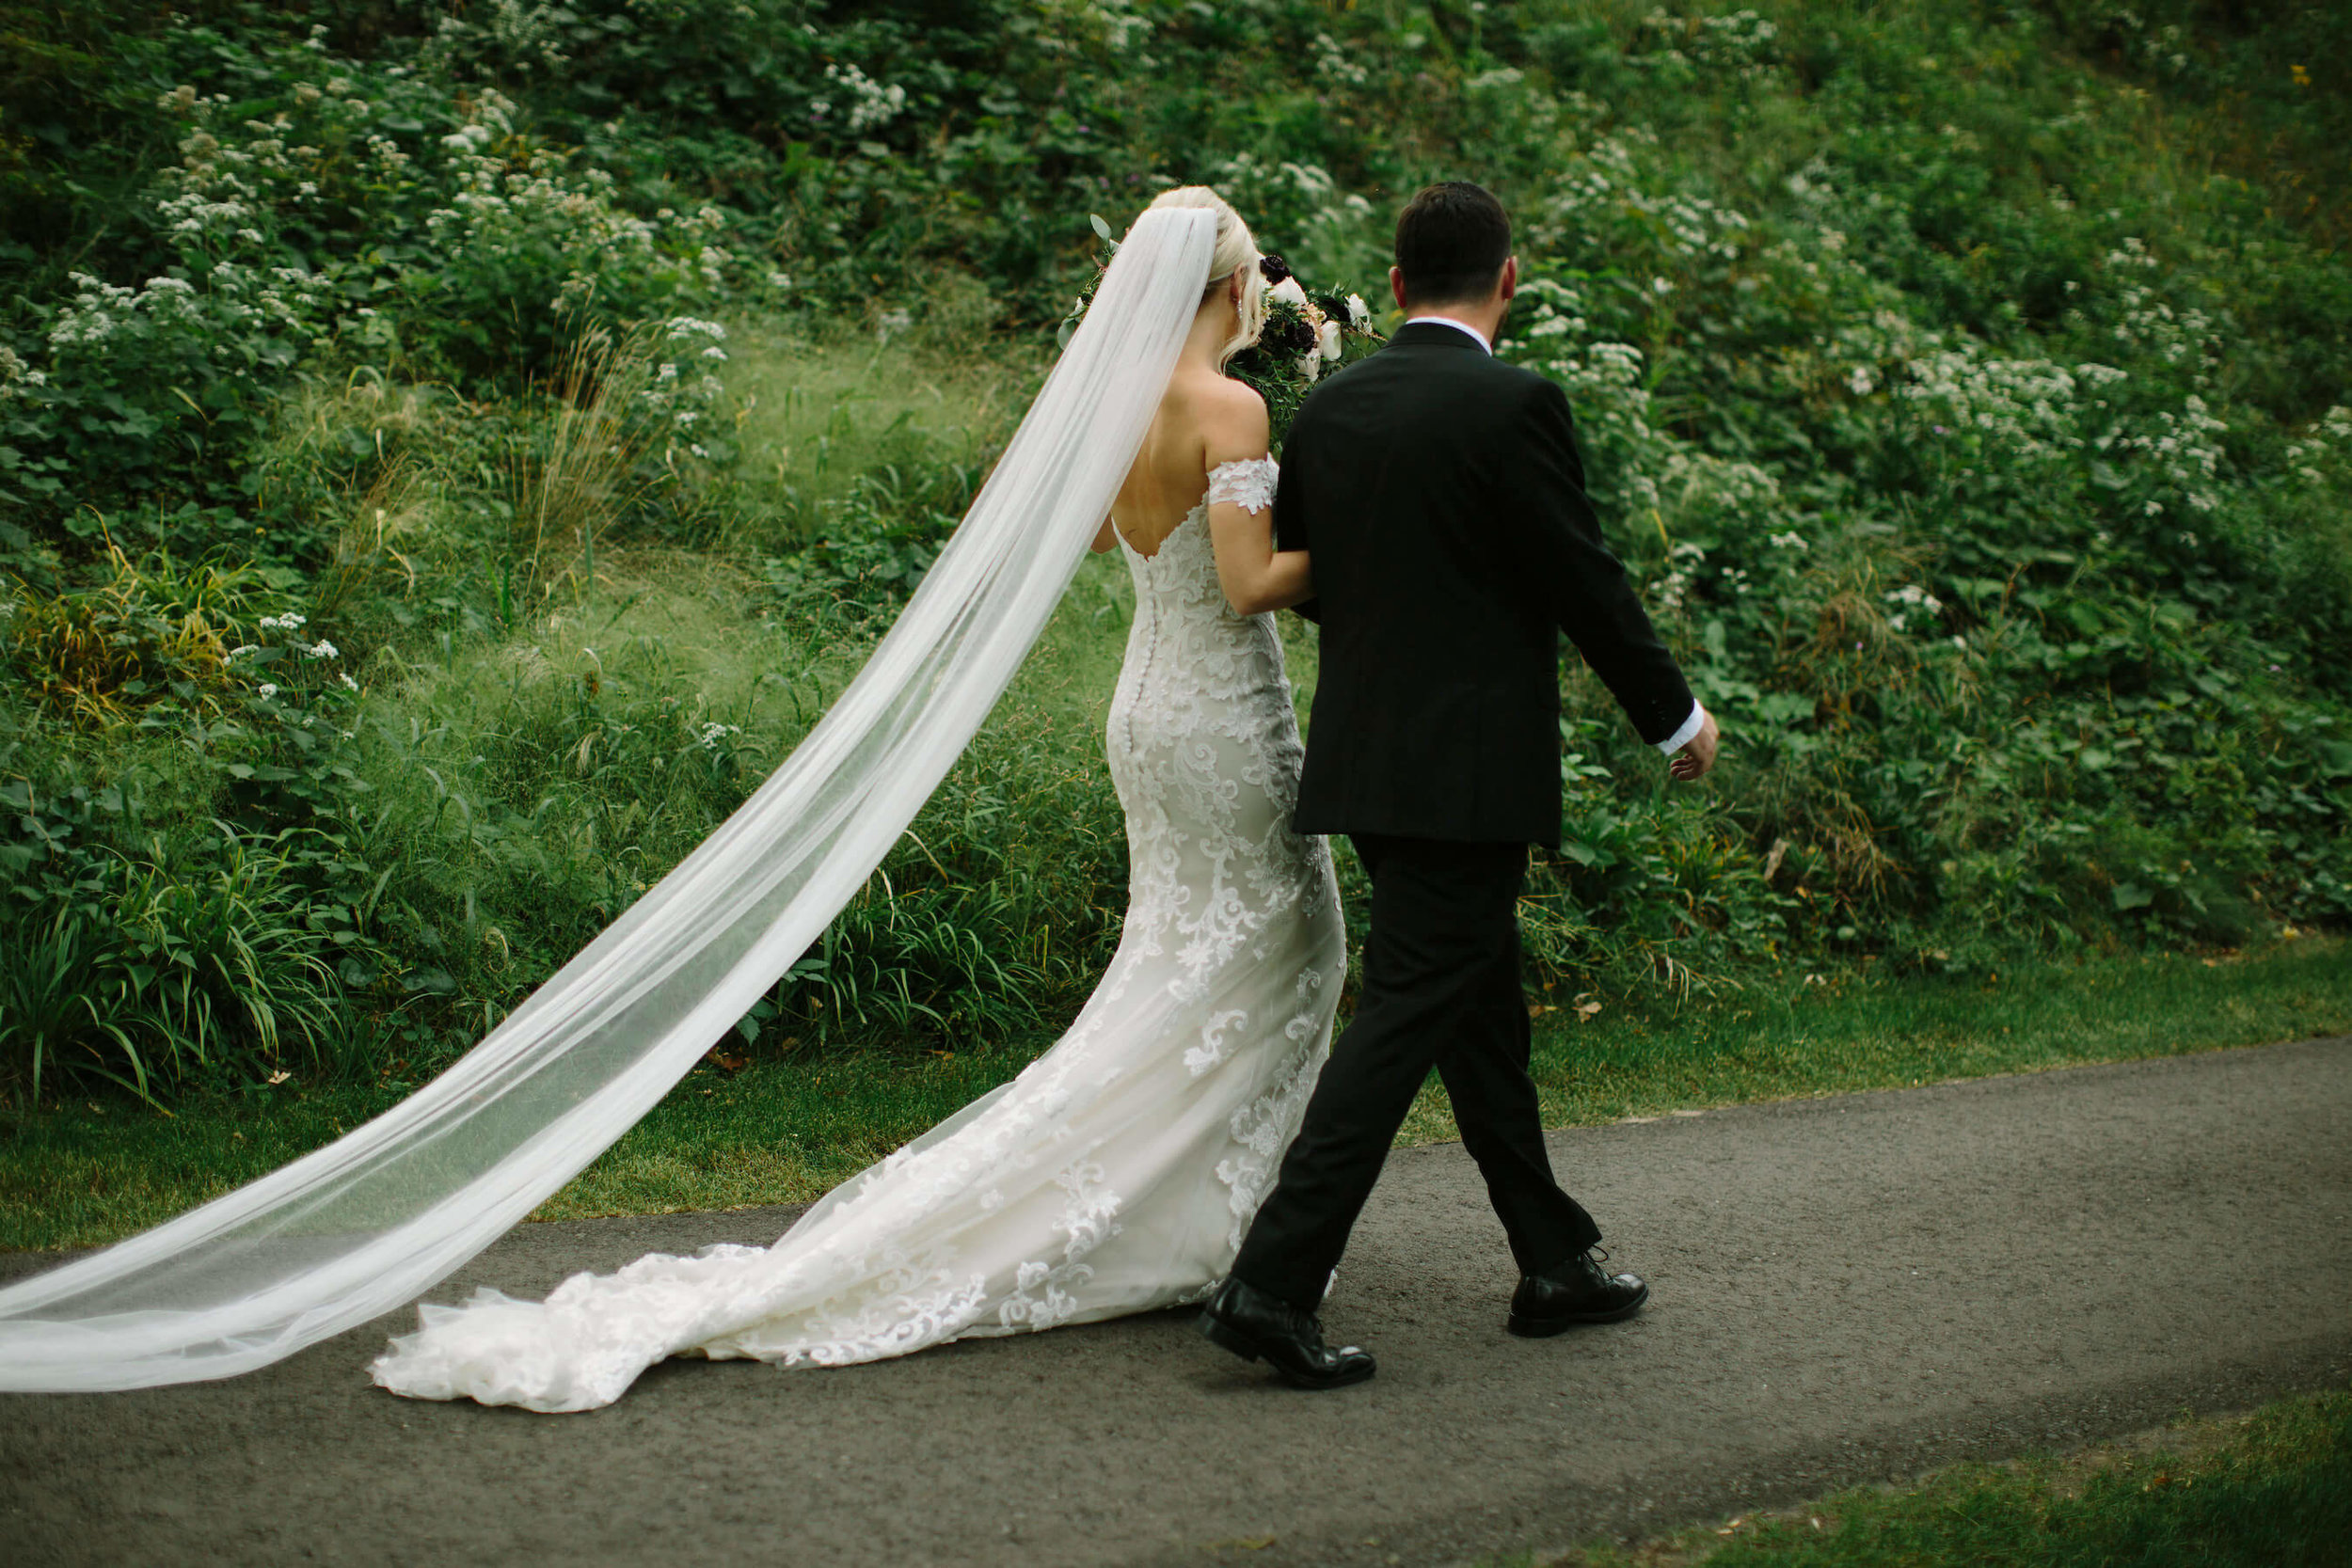 engle-olson-april-cj-wedding-jessica-holleque-12.jpg